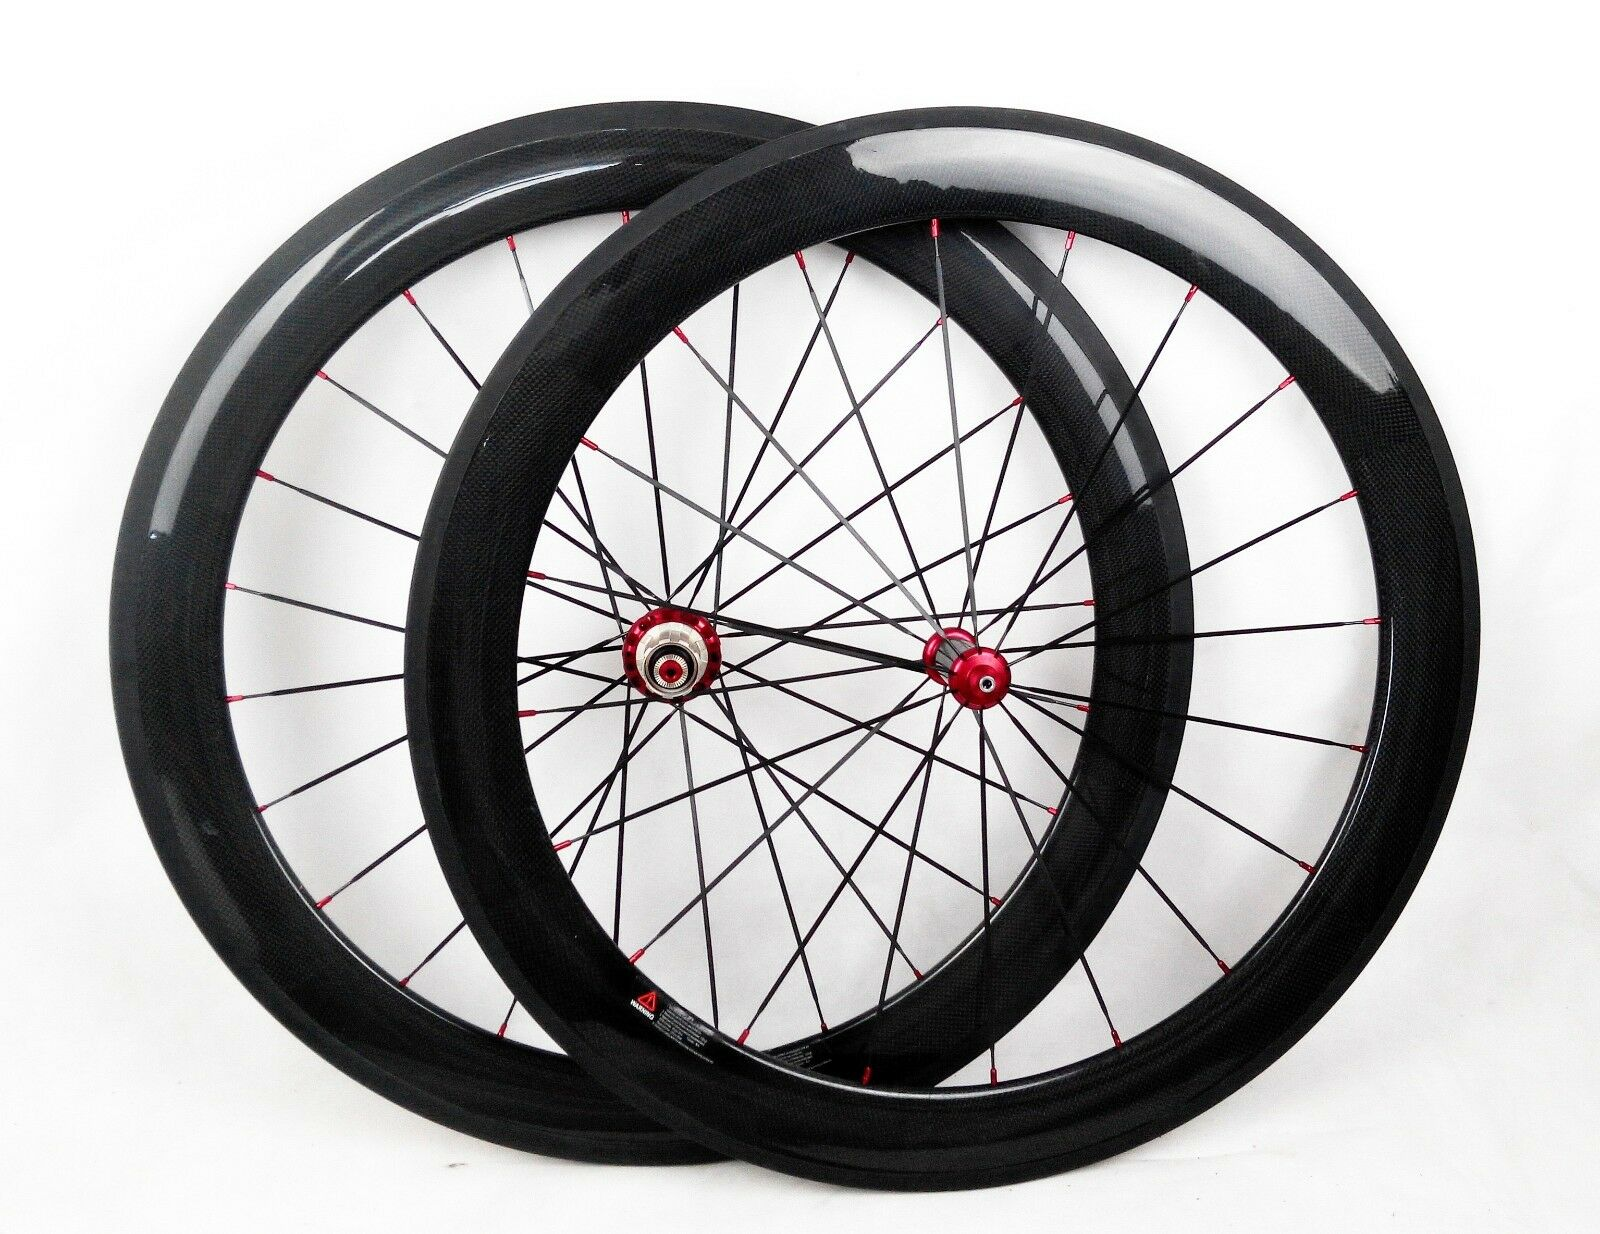 Speedcarbon11 60mm tubular carbon fiber road race wheel straight pull 25mm width